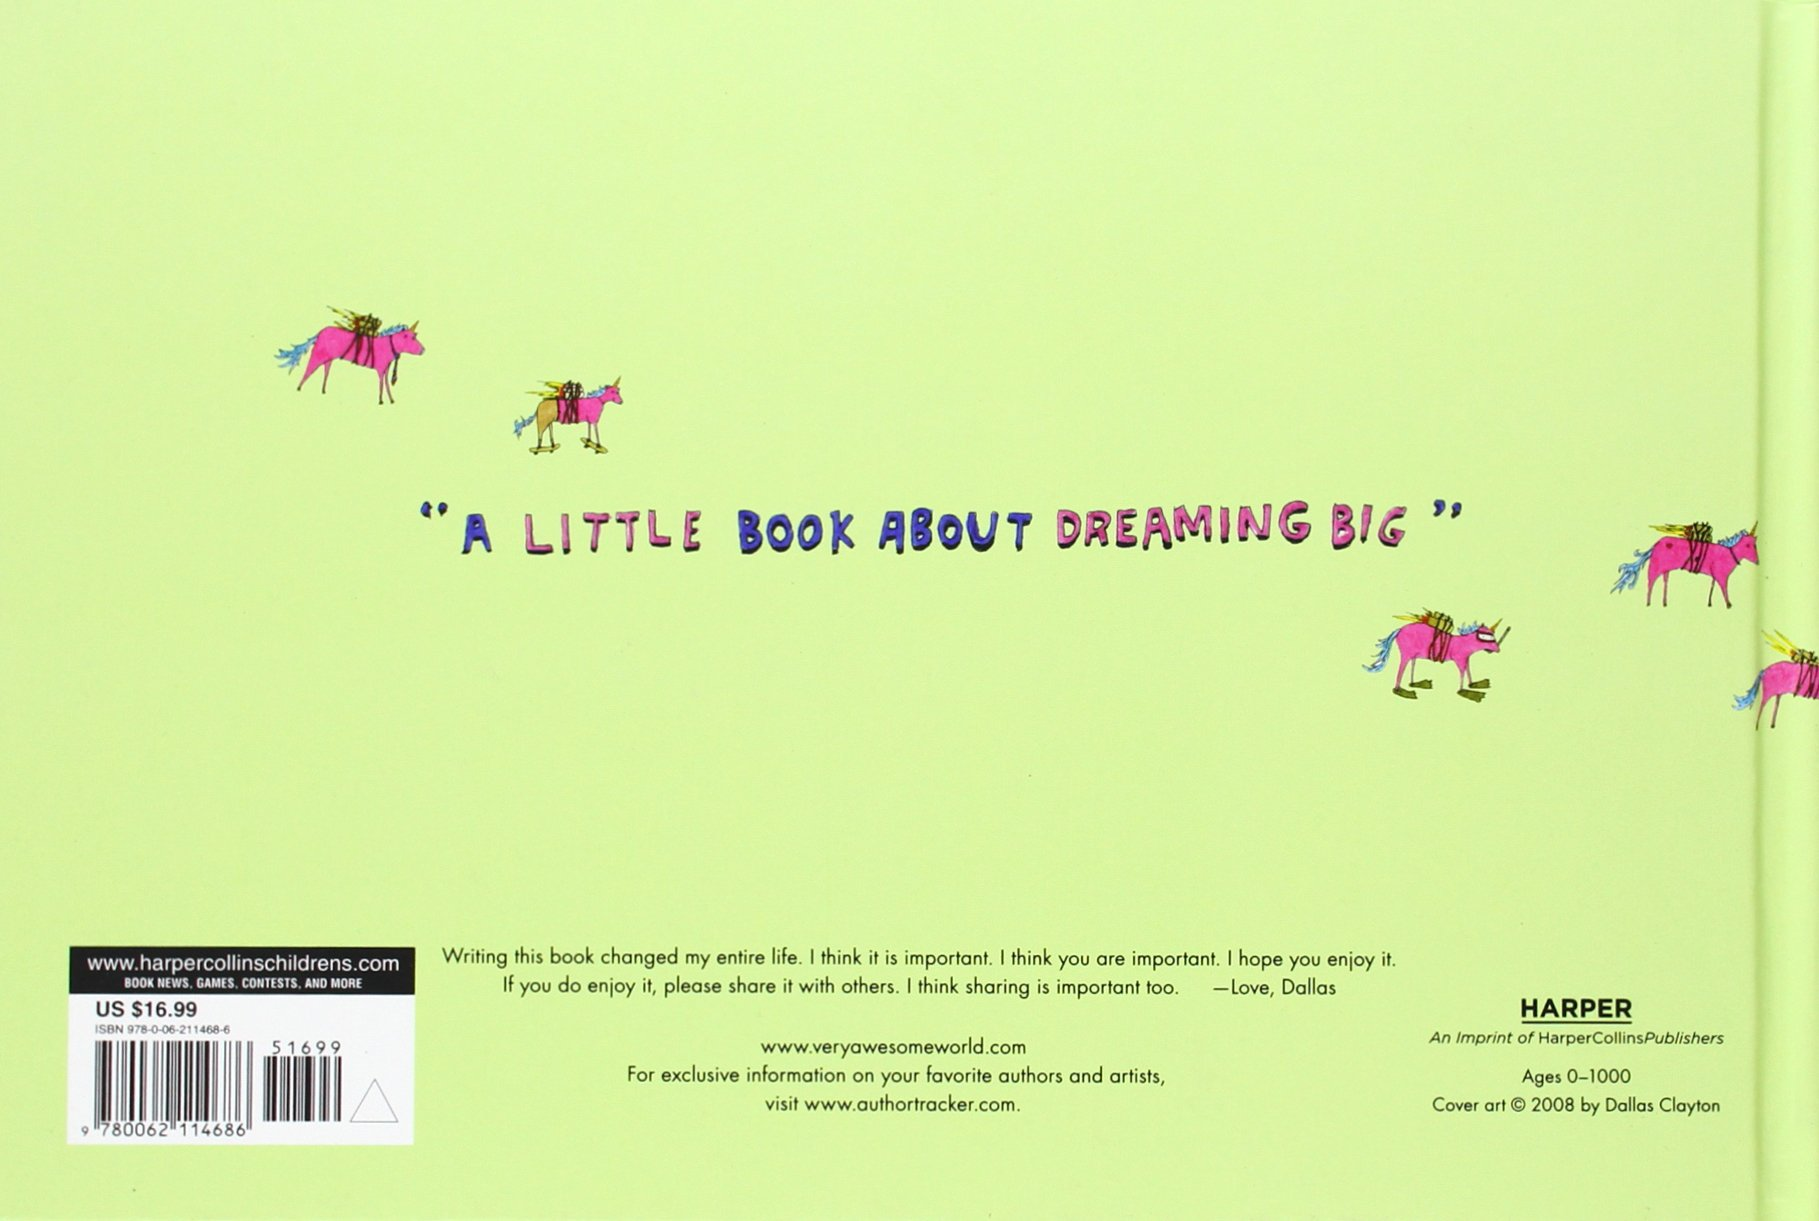 Dallas Clayton: 9780062114686: Amazon: Books